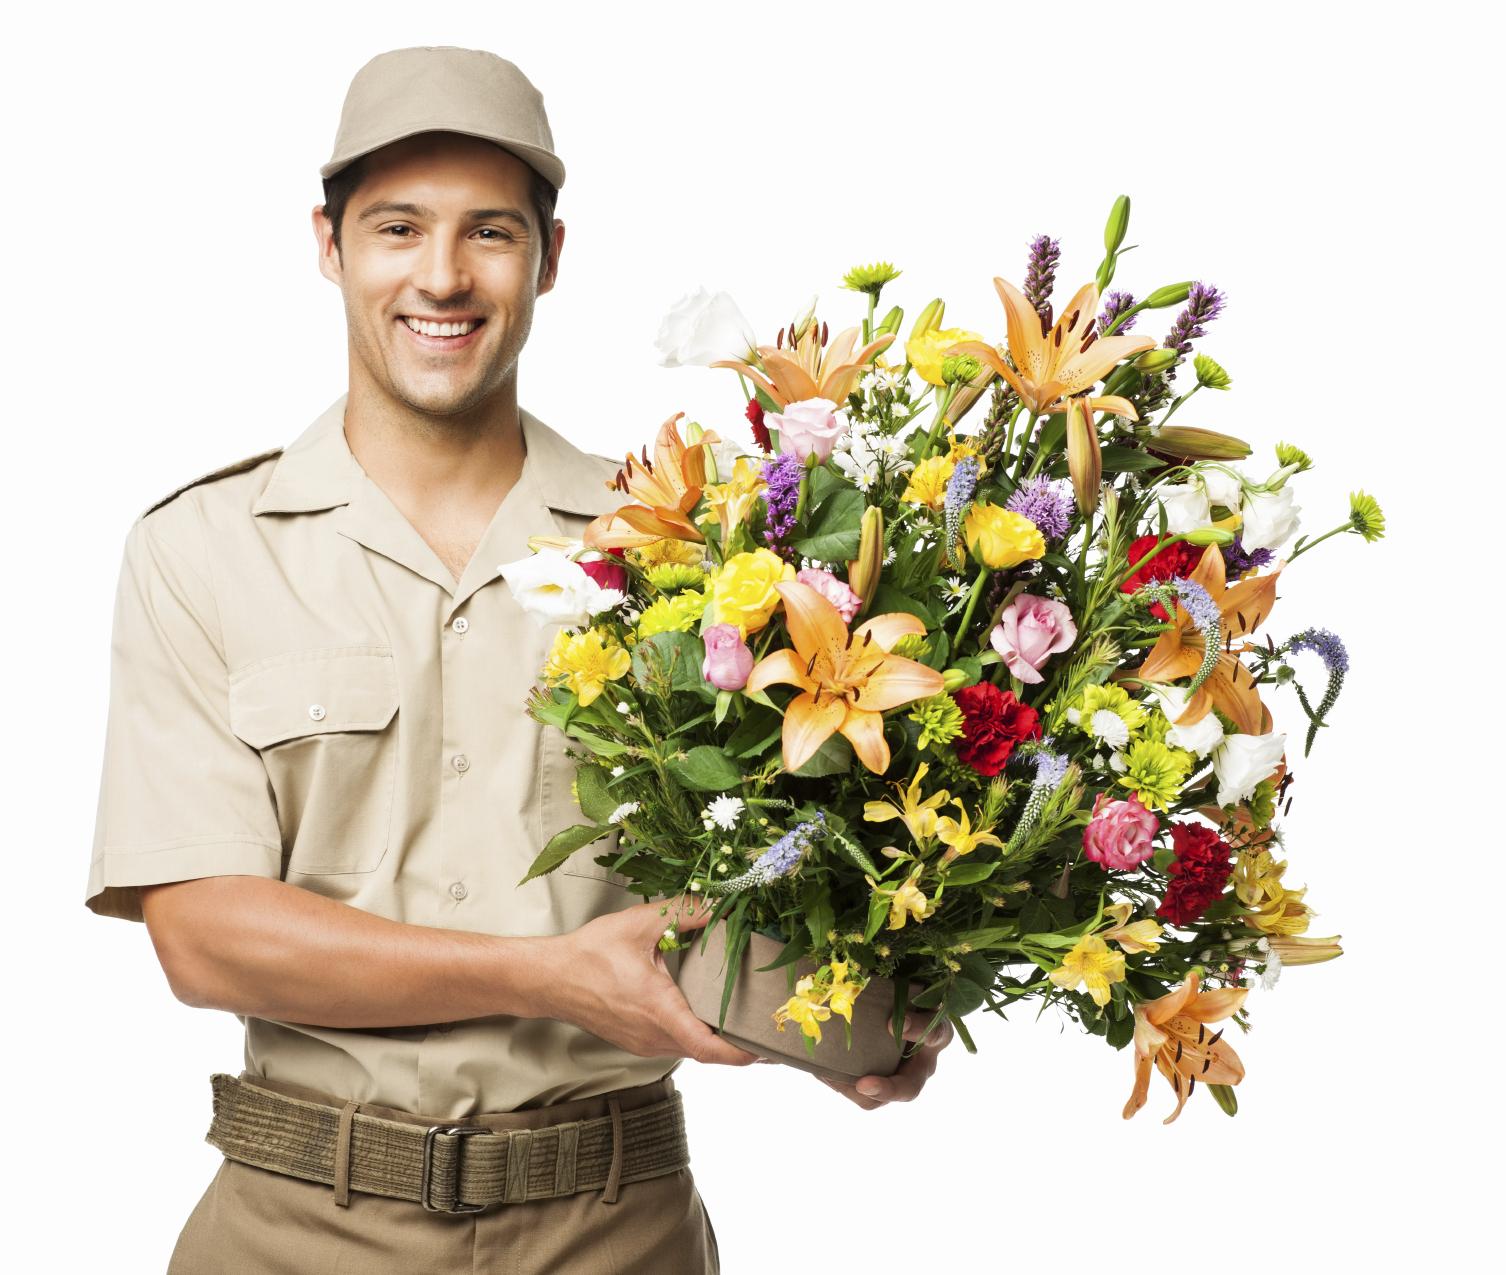 Dostavka-tsvetov.com цветы с доставкой секс-подарок мужчине